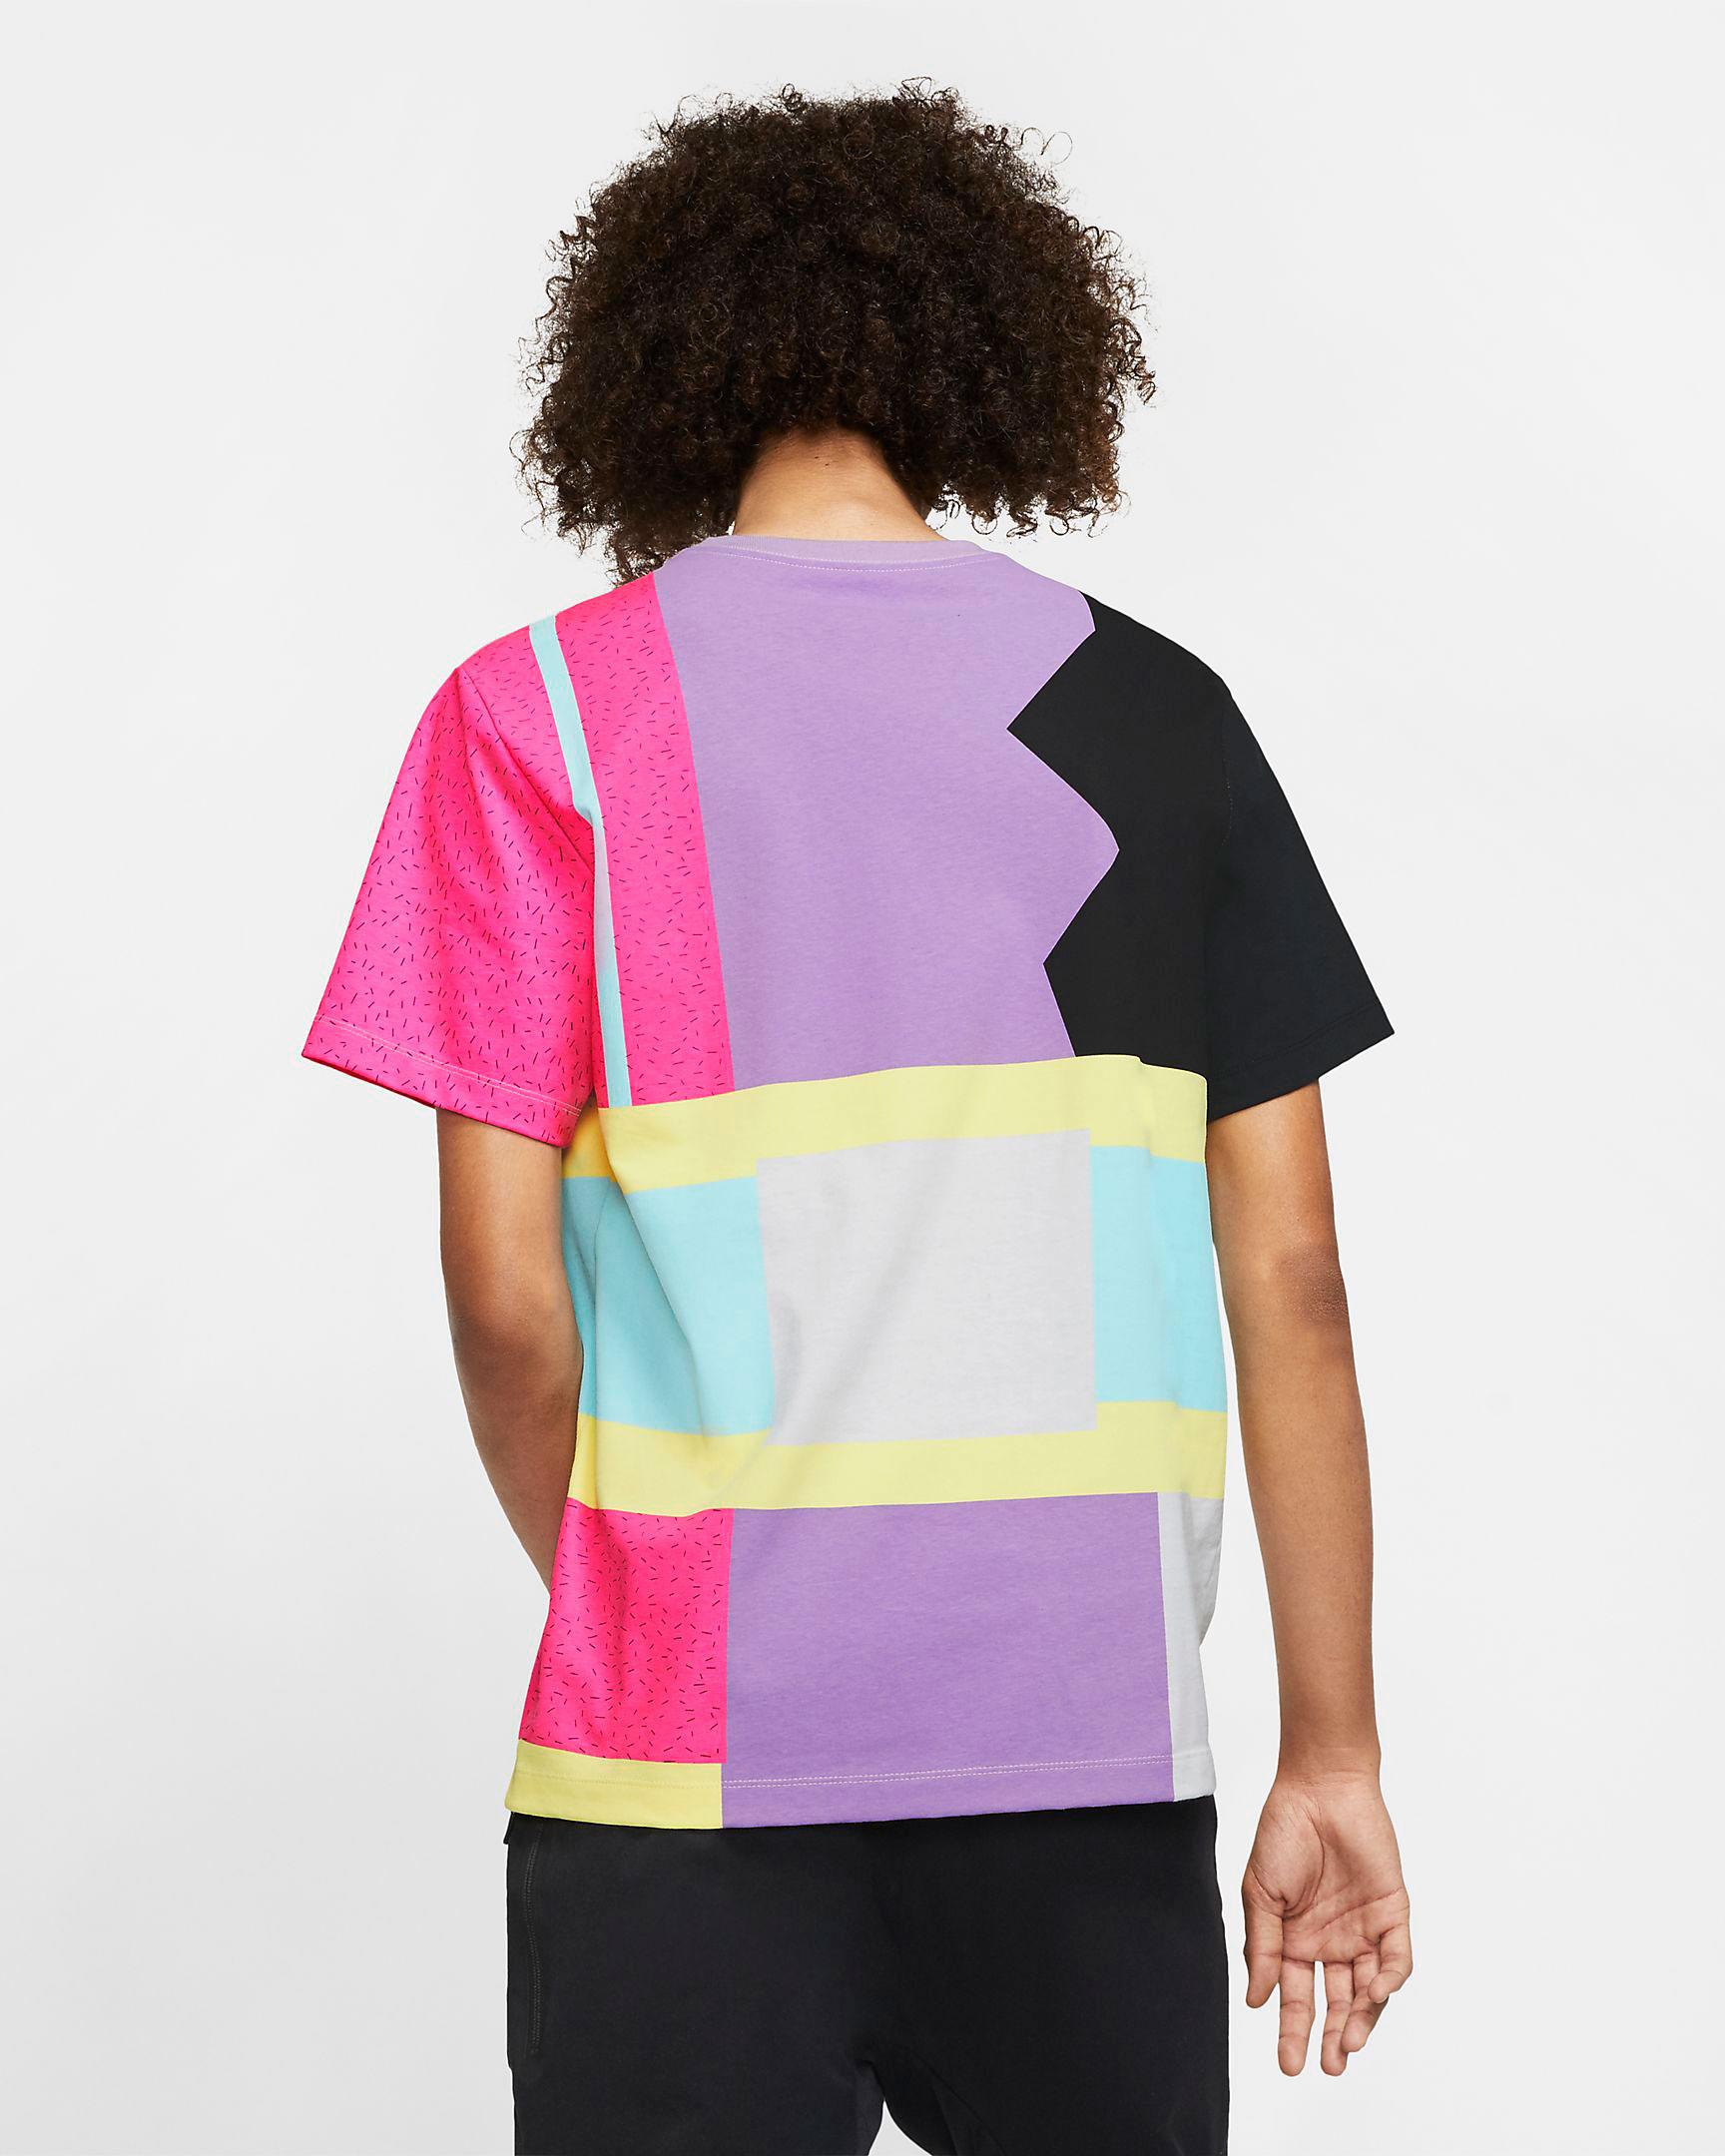 nike-geometric-shirt-3